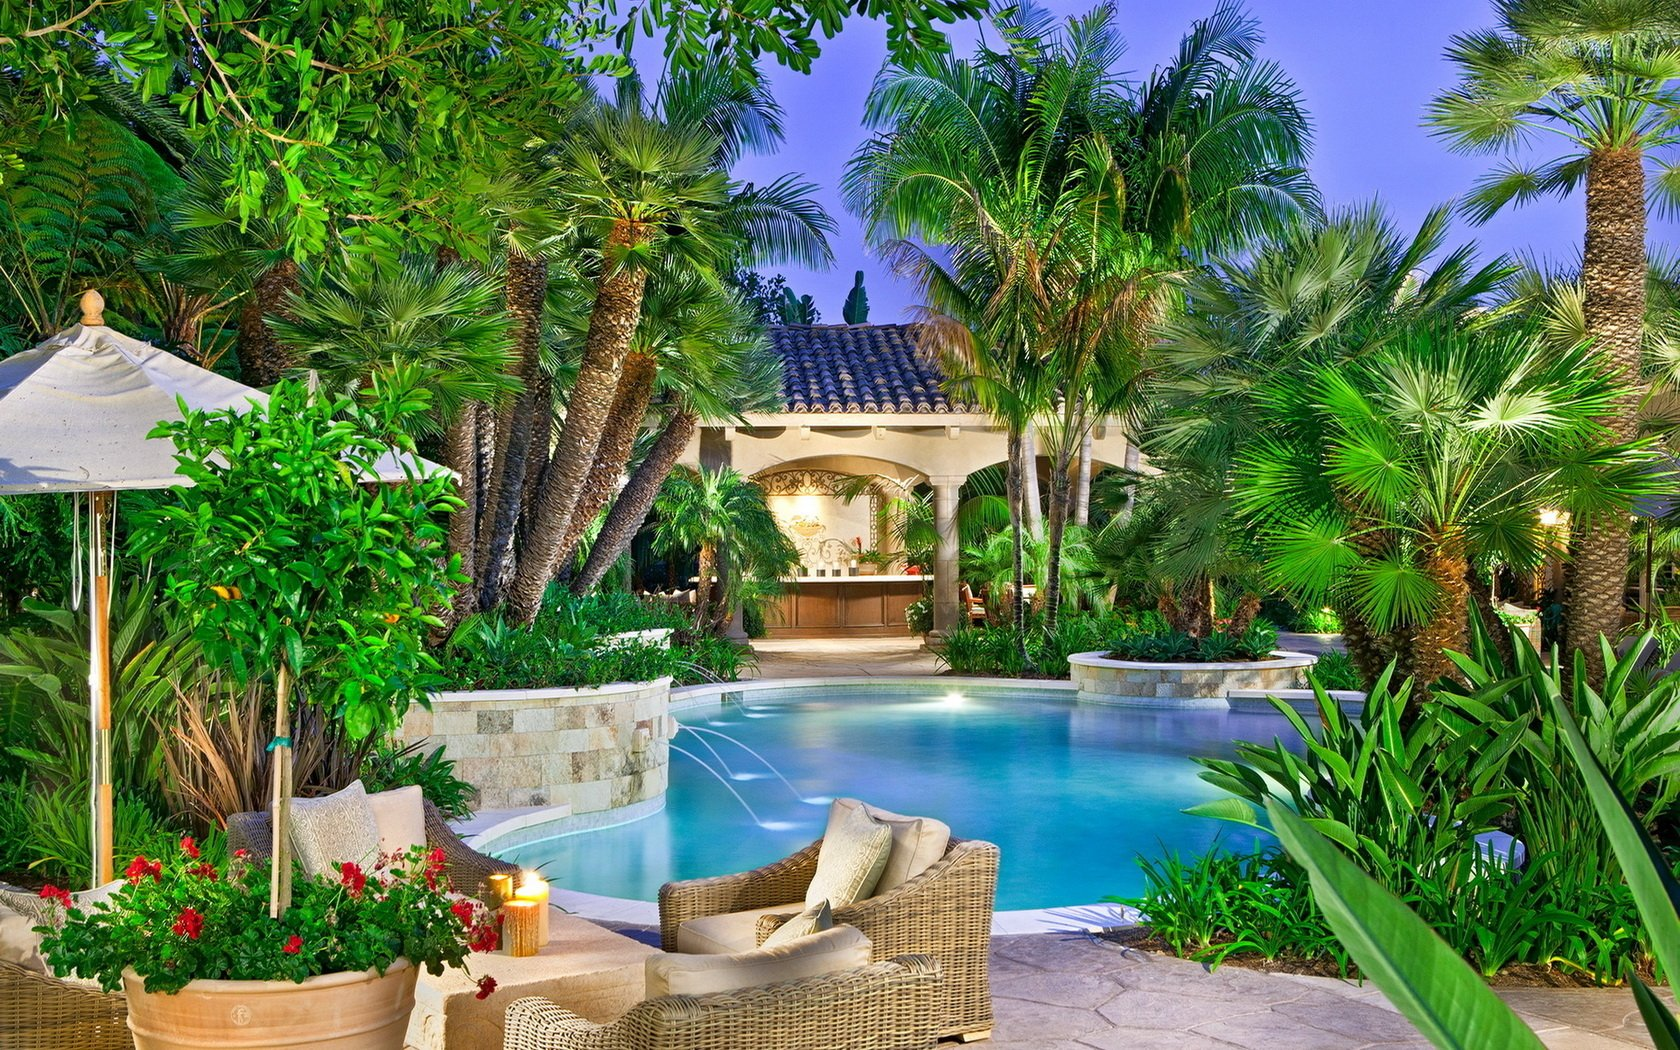 Piscine fond d 39 cran and arri re plan 1680x1050 id 385778 - Jardines con piscinas fotos ...